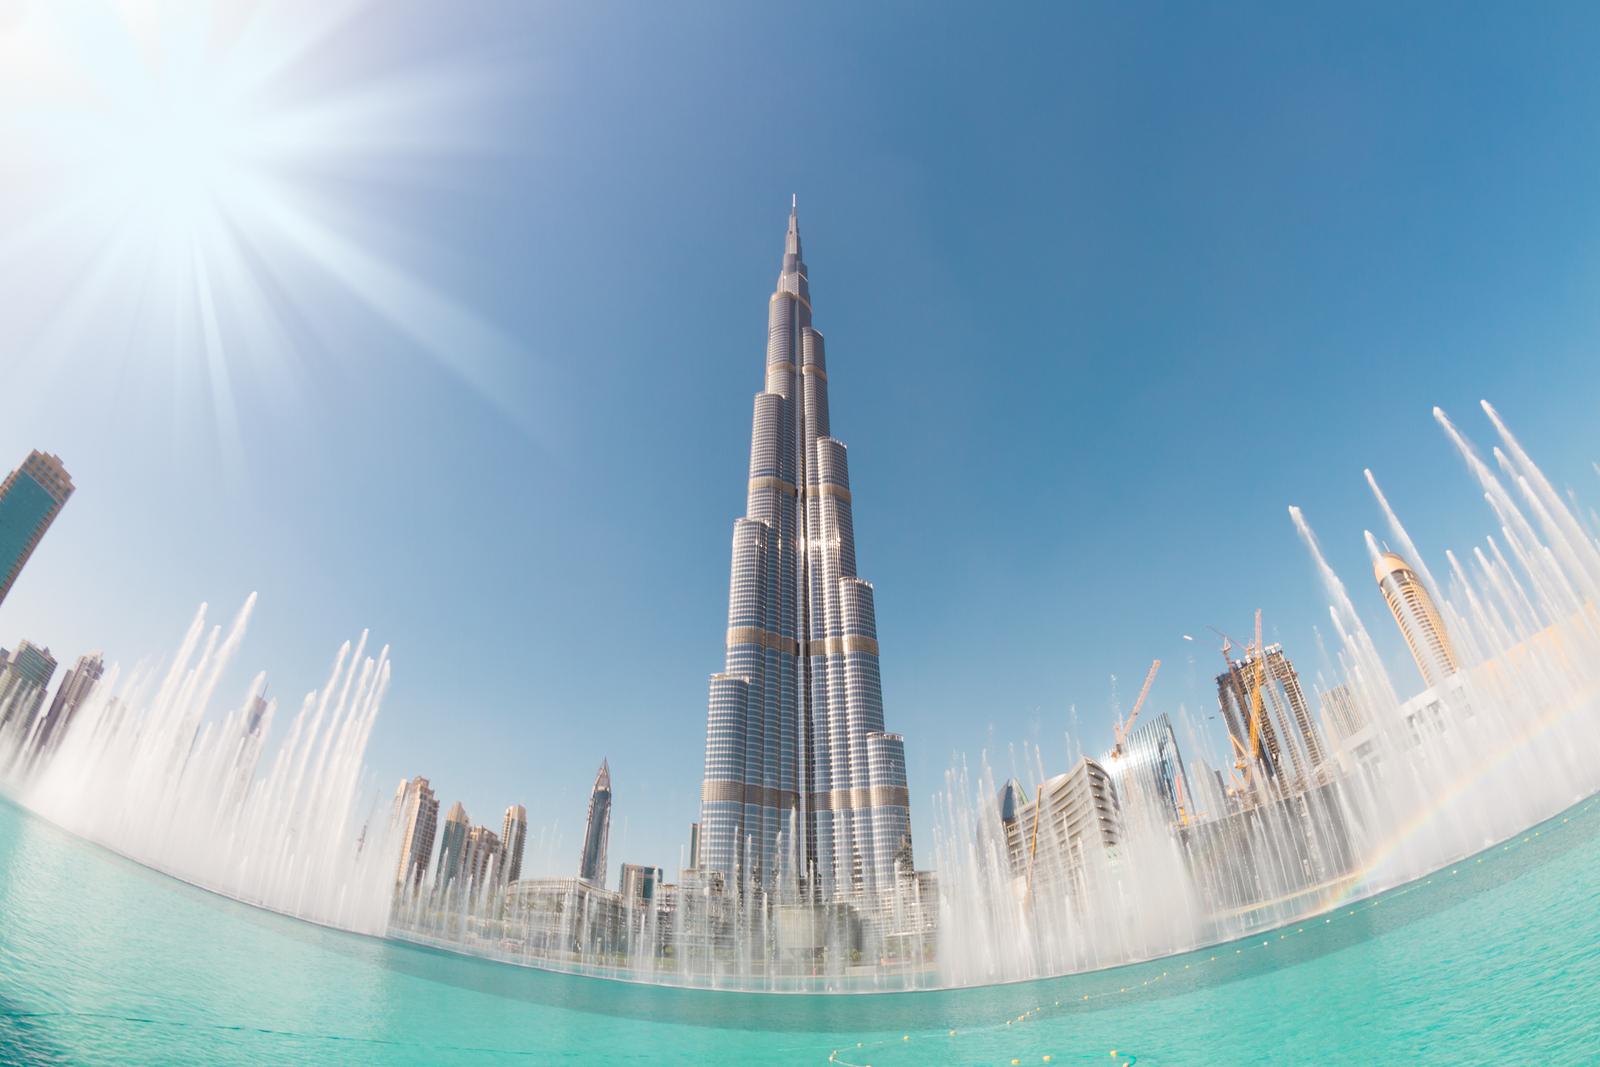 Burj Khalifa and the Dubai Fountain